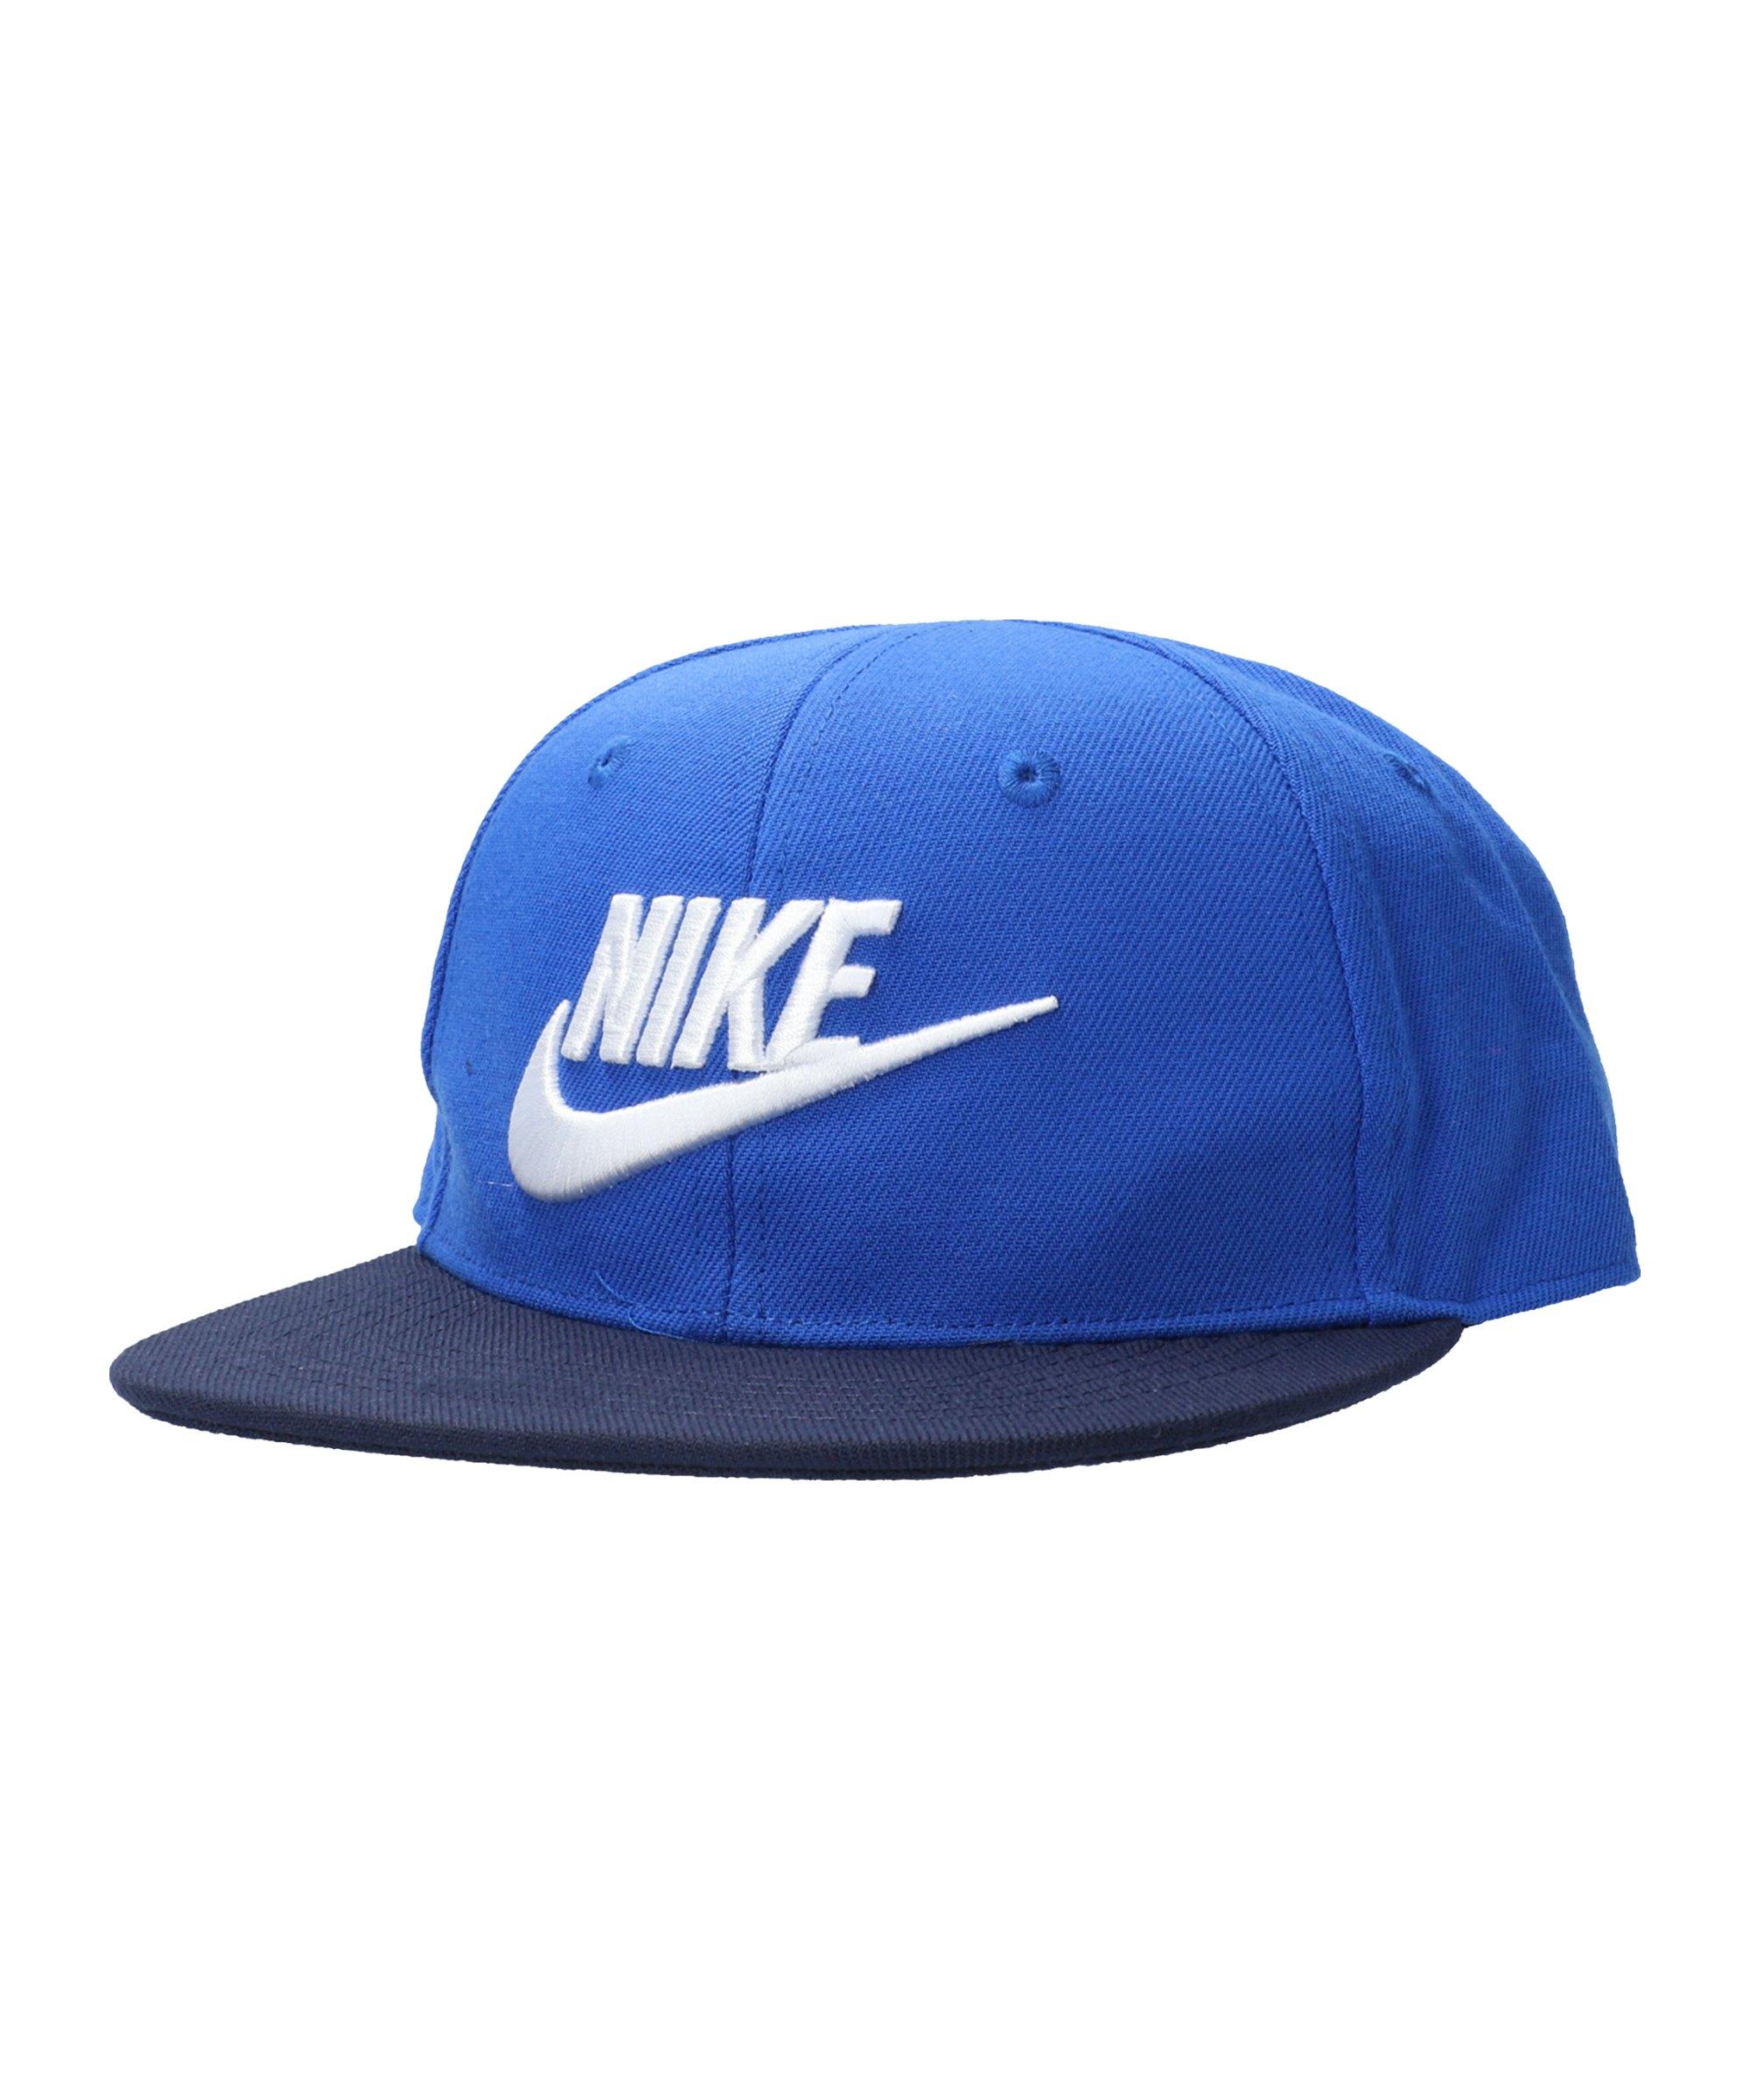 Nike True Limitless Snapback Cap Kids Blau FU89 - blau